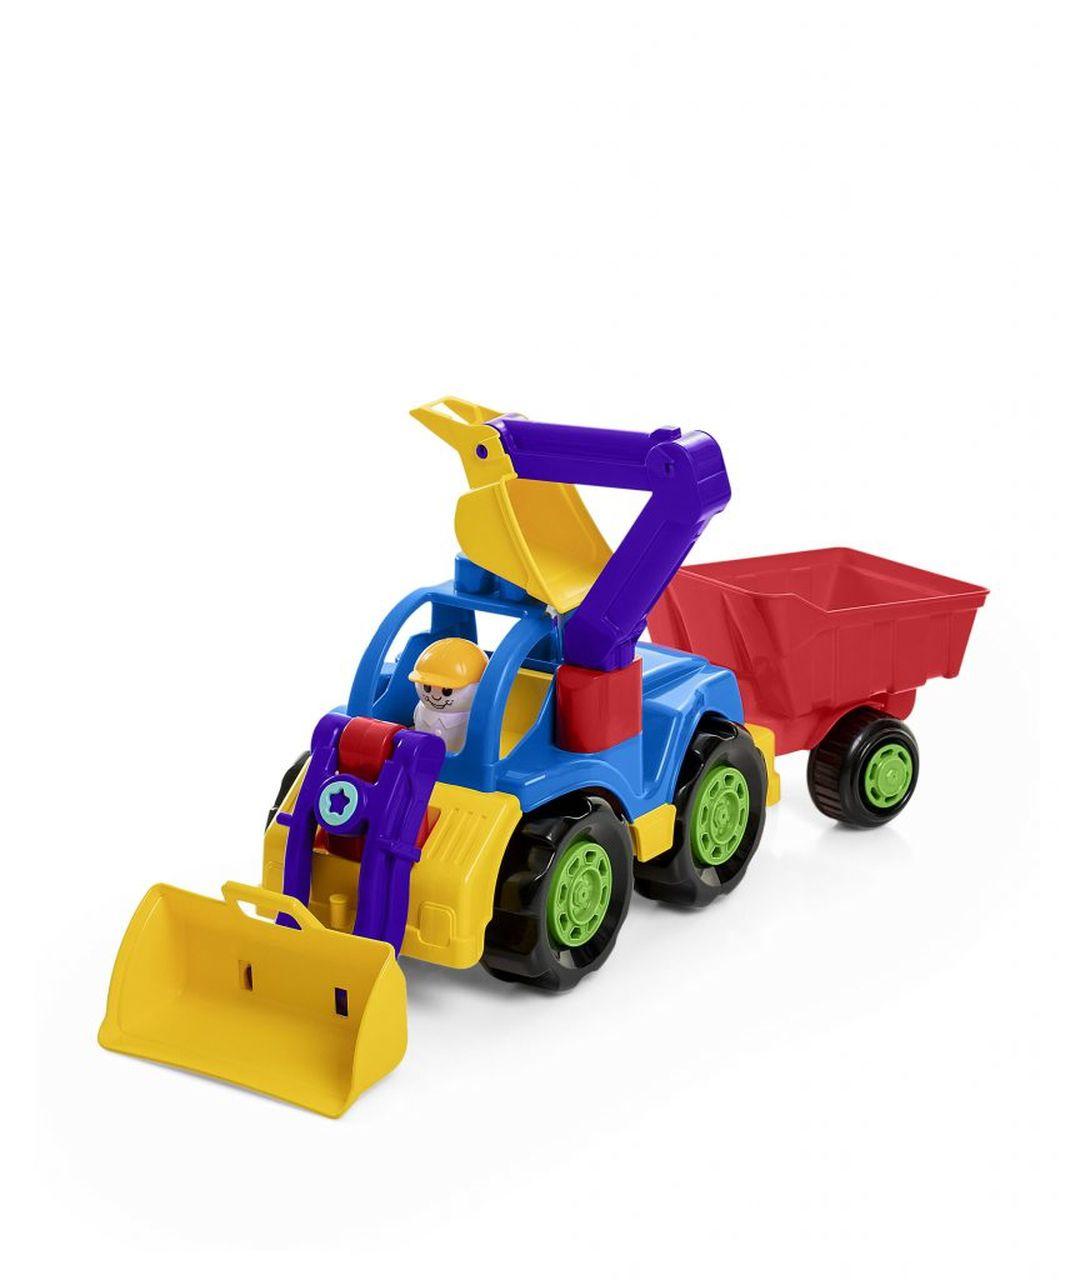 Brinquedo Infantil Rodadinhos Blocks Completo - Tateti